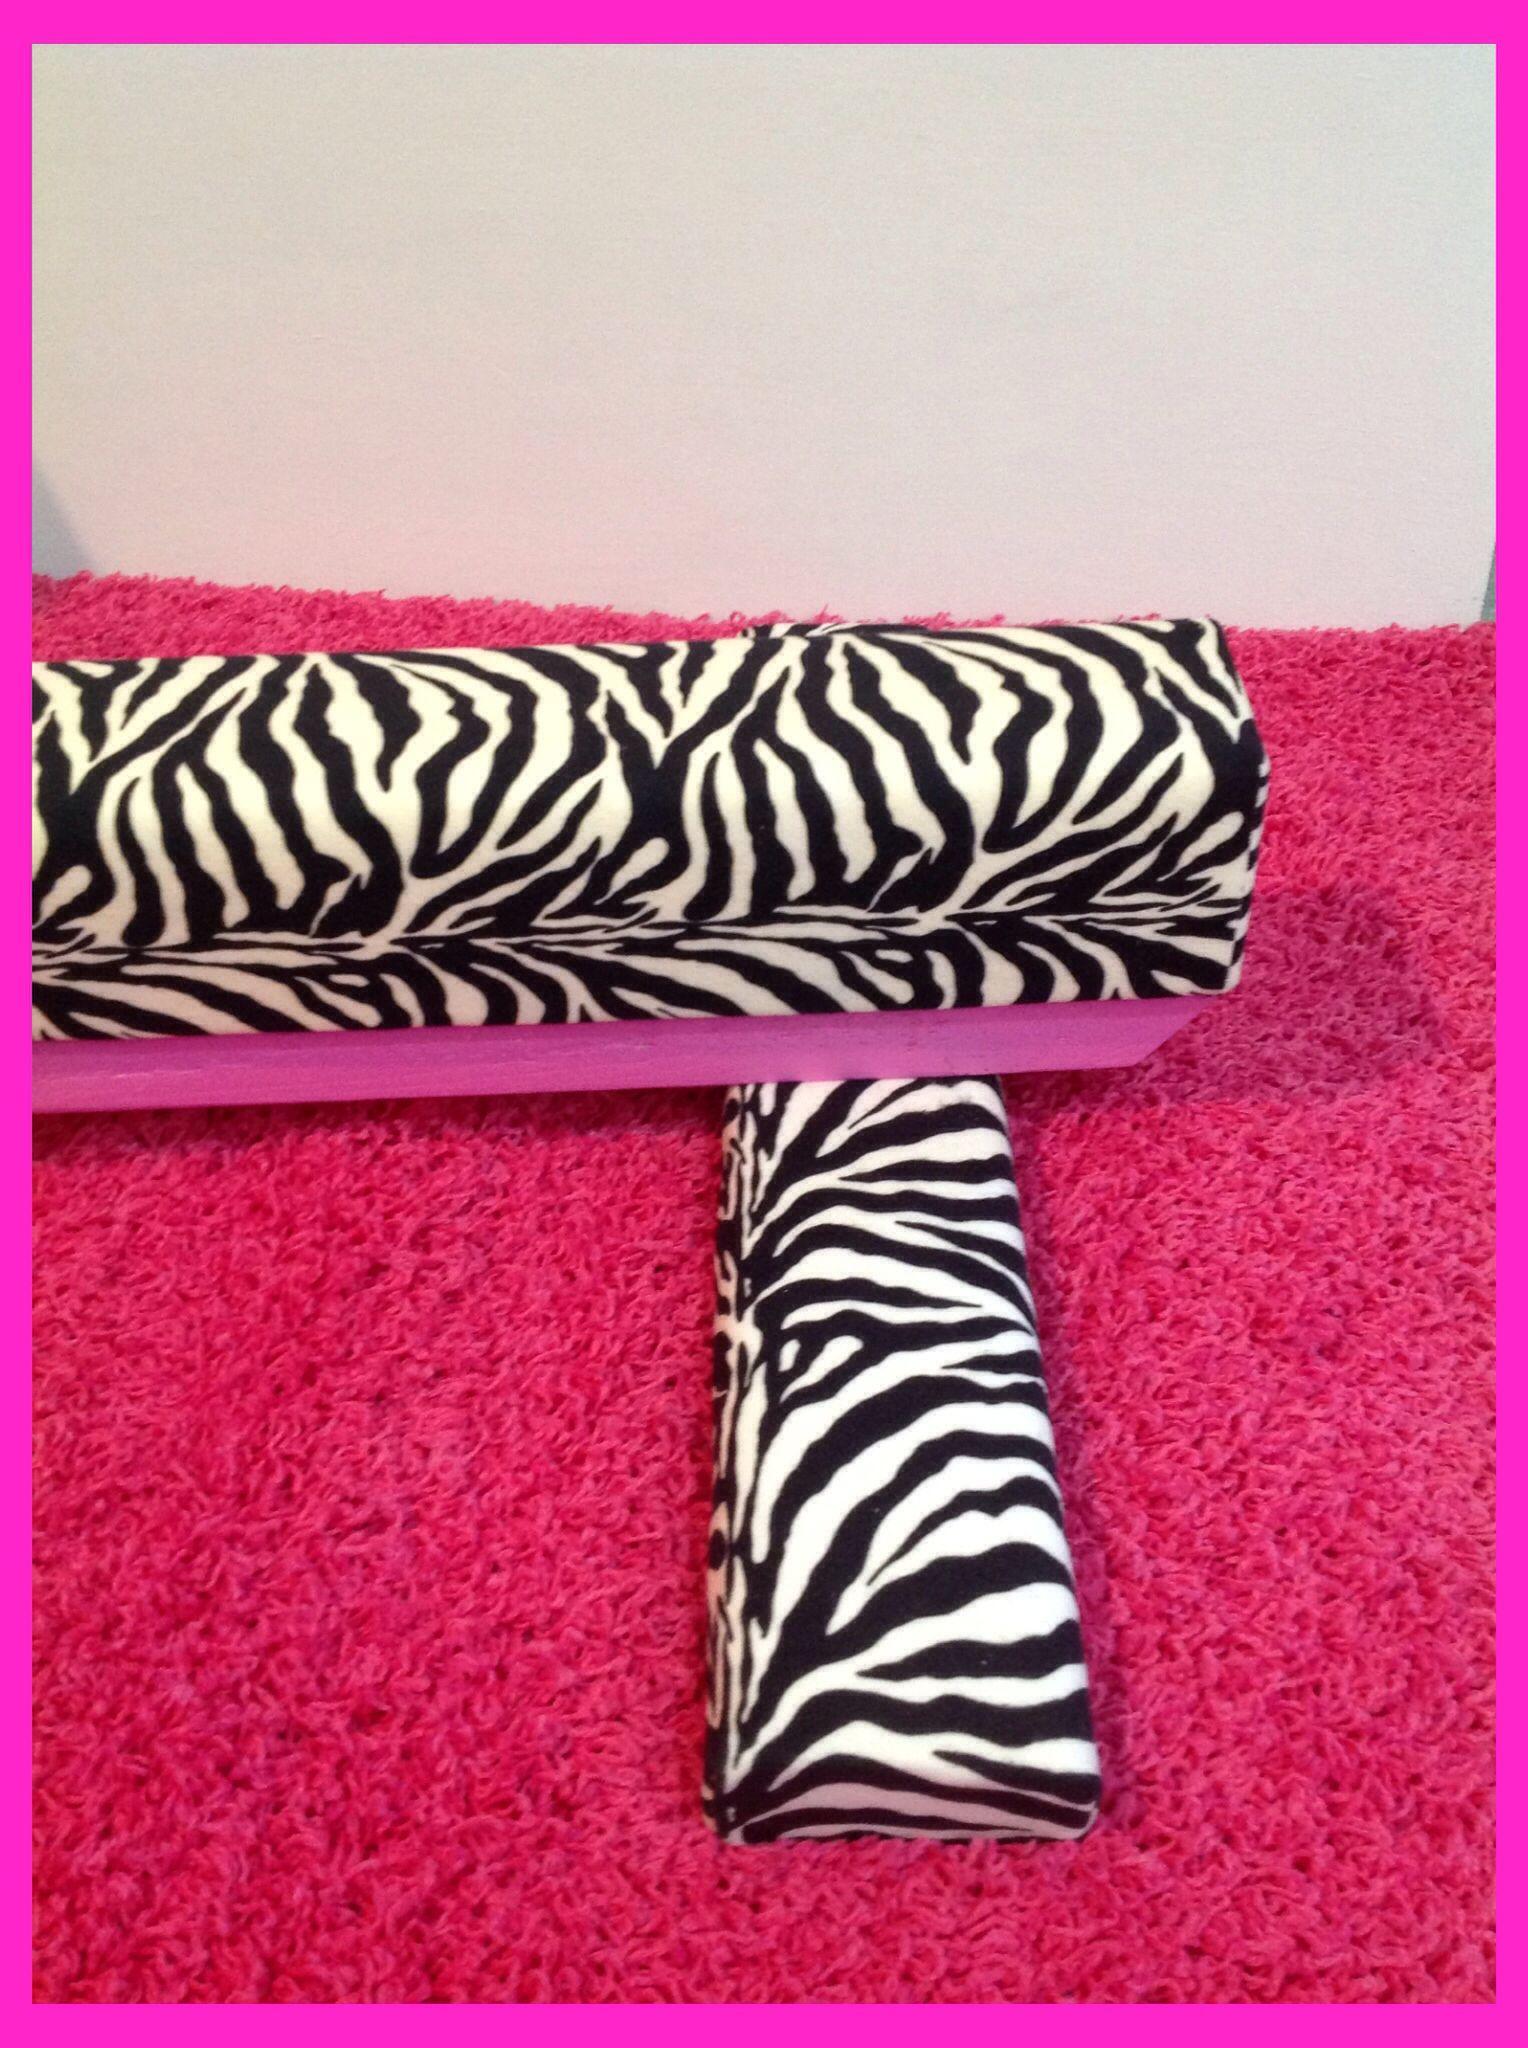 Zebra Print Gymnastics Balance Beam With Hot Pink Base And Zebra Padded Feet Low Gymnastics Balance Beam Zebra Print Gymnastics